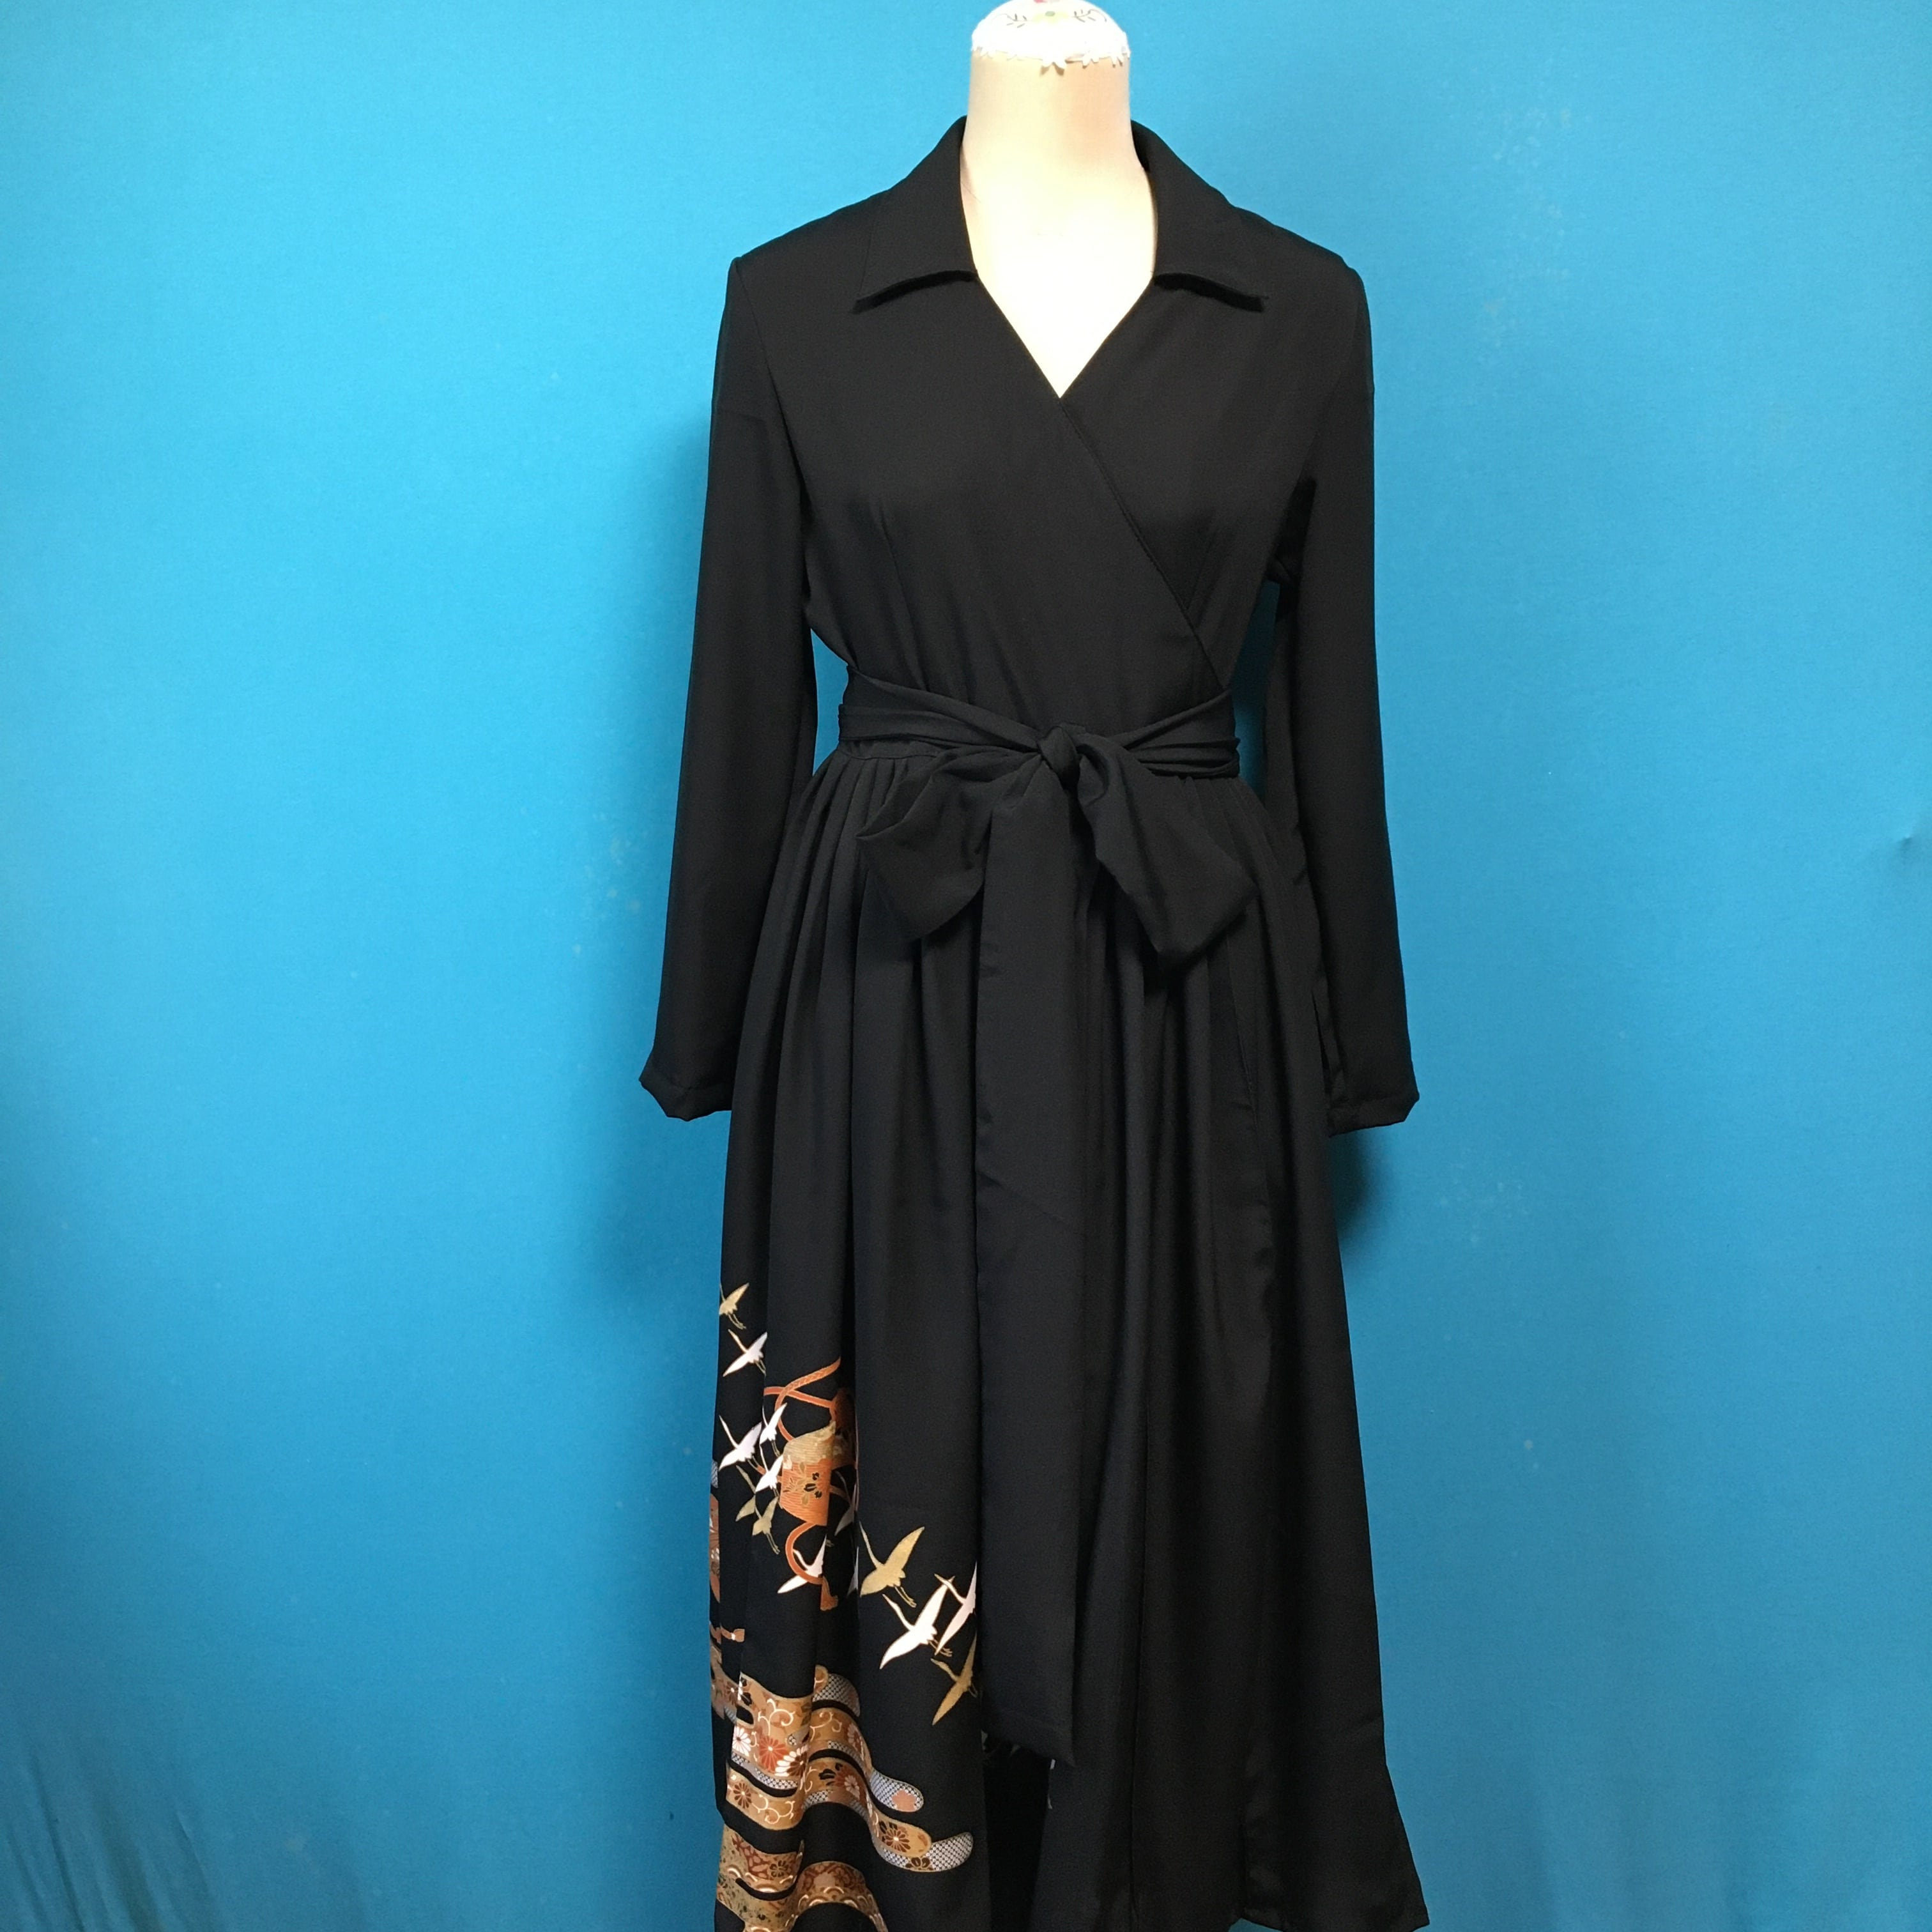 Vintage 留袖ドレス*US 8